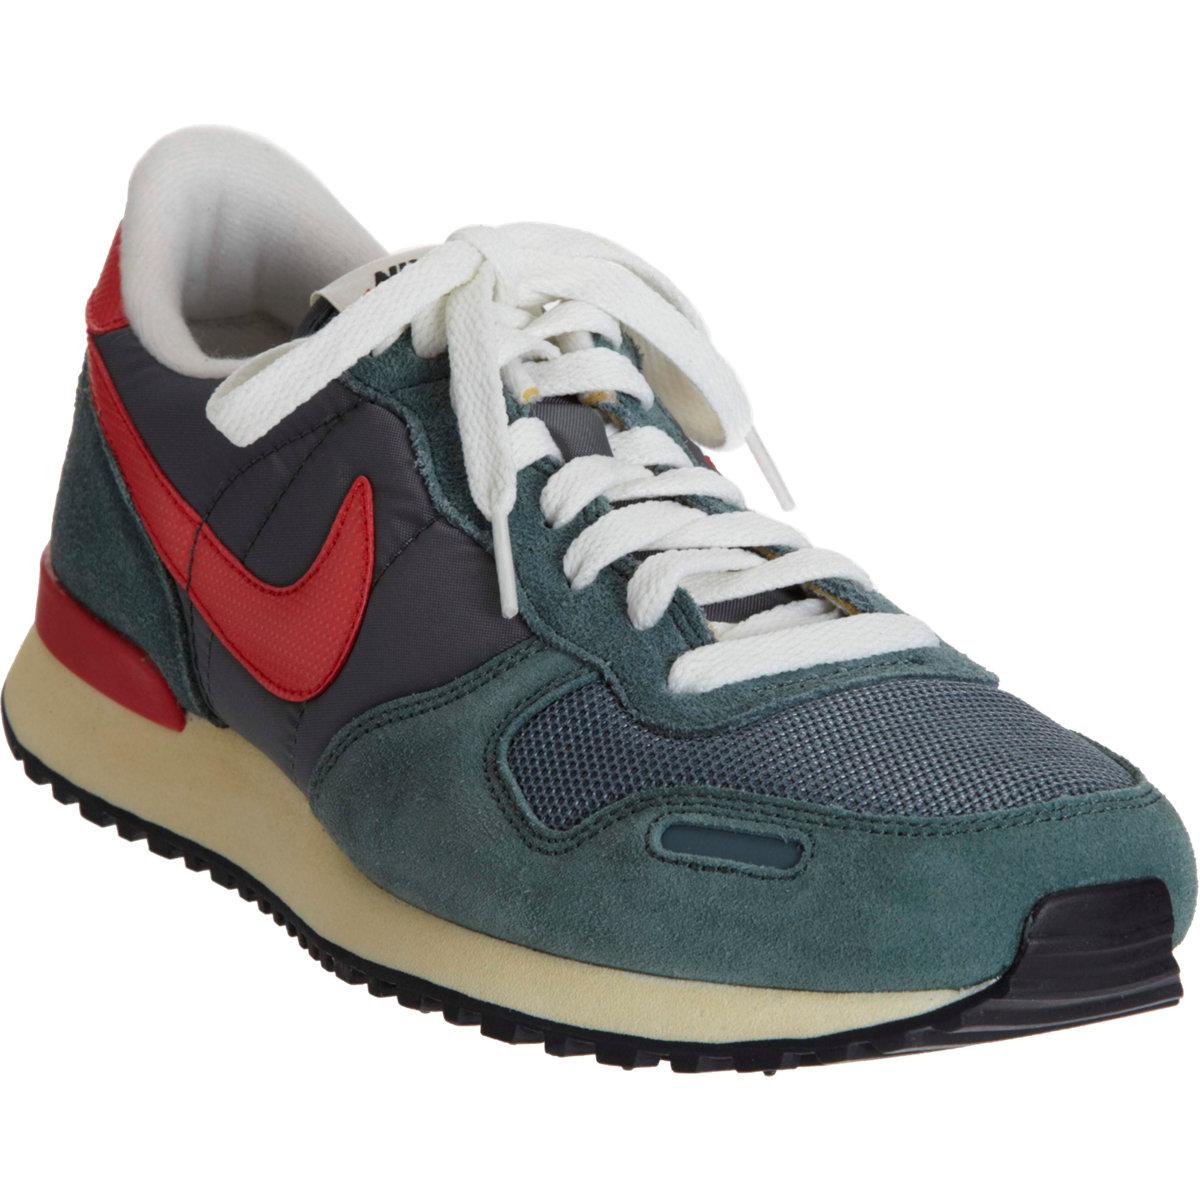 info for 9033b 551dd Nike Air Vortex Vintage in Gray for Men - Lyst